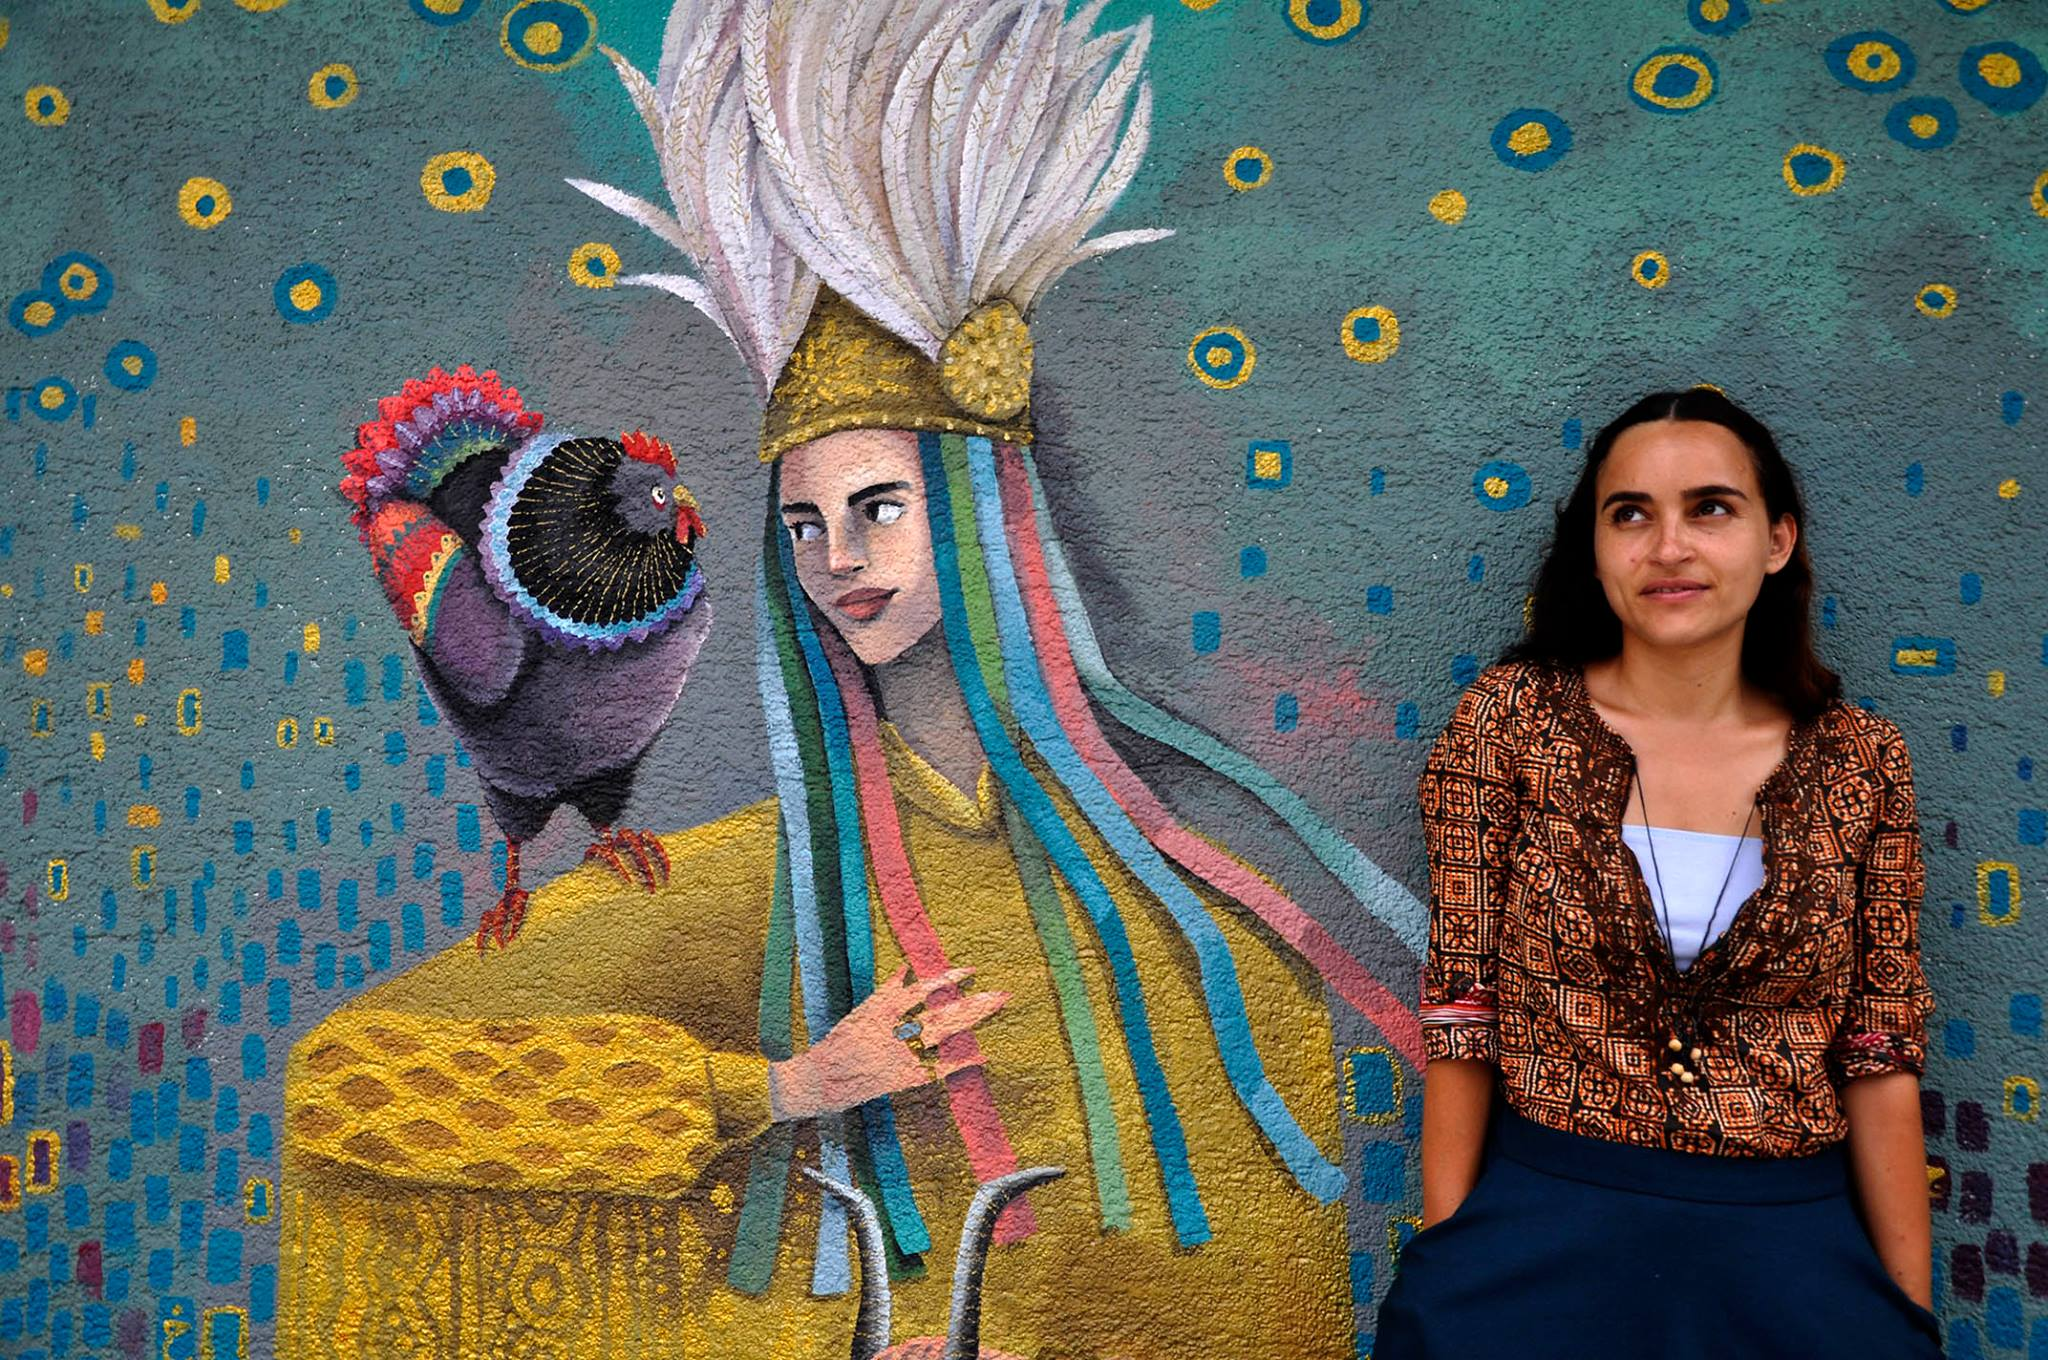 Artist Diala Brisly